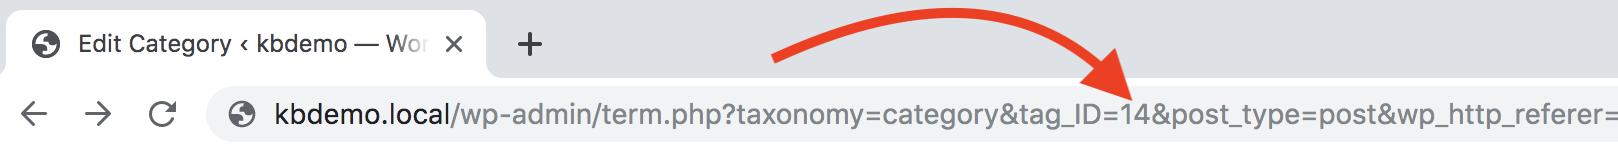 Category URL ID